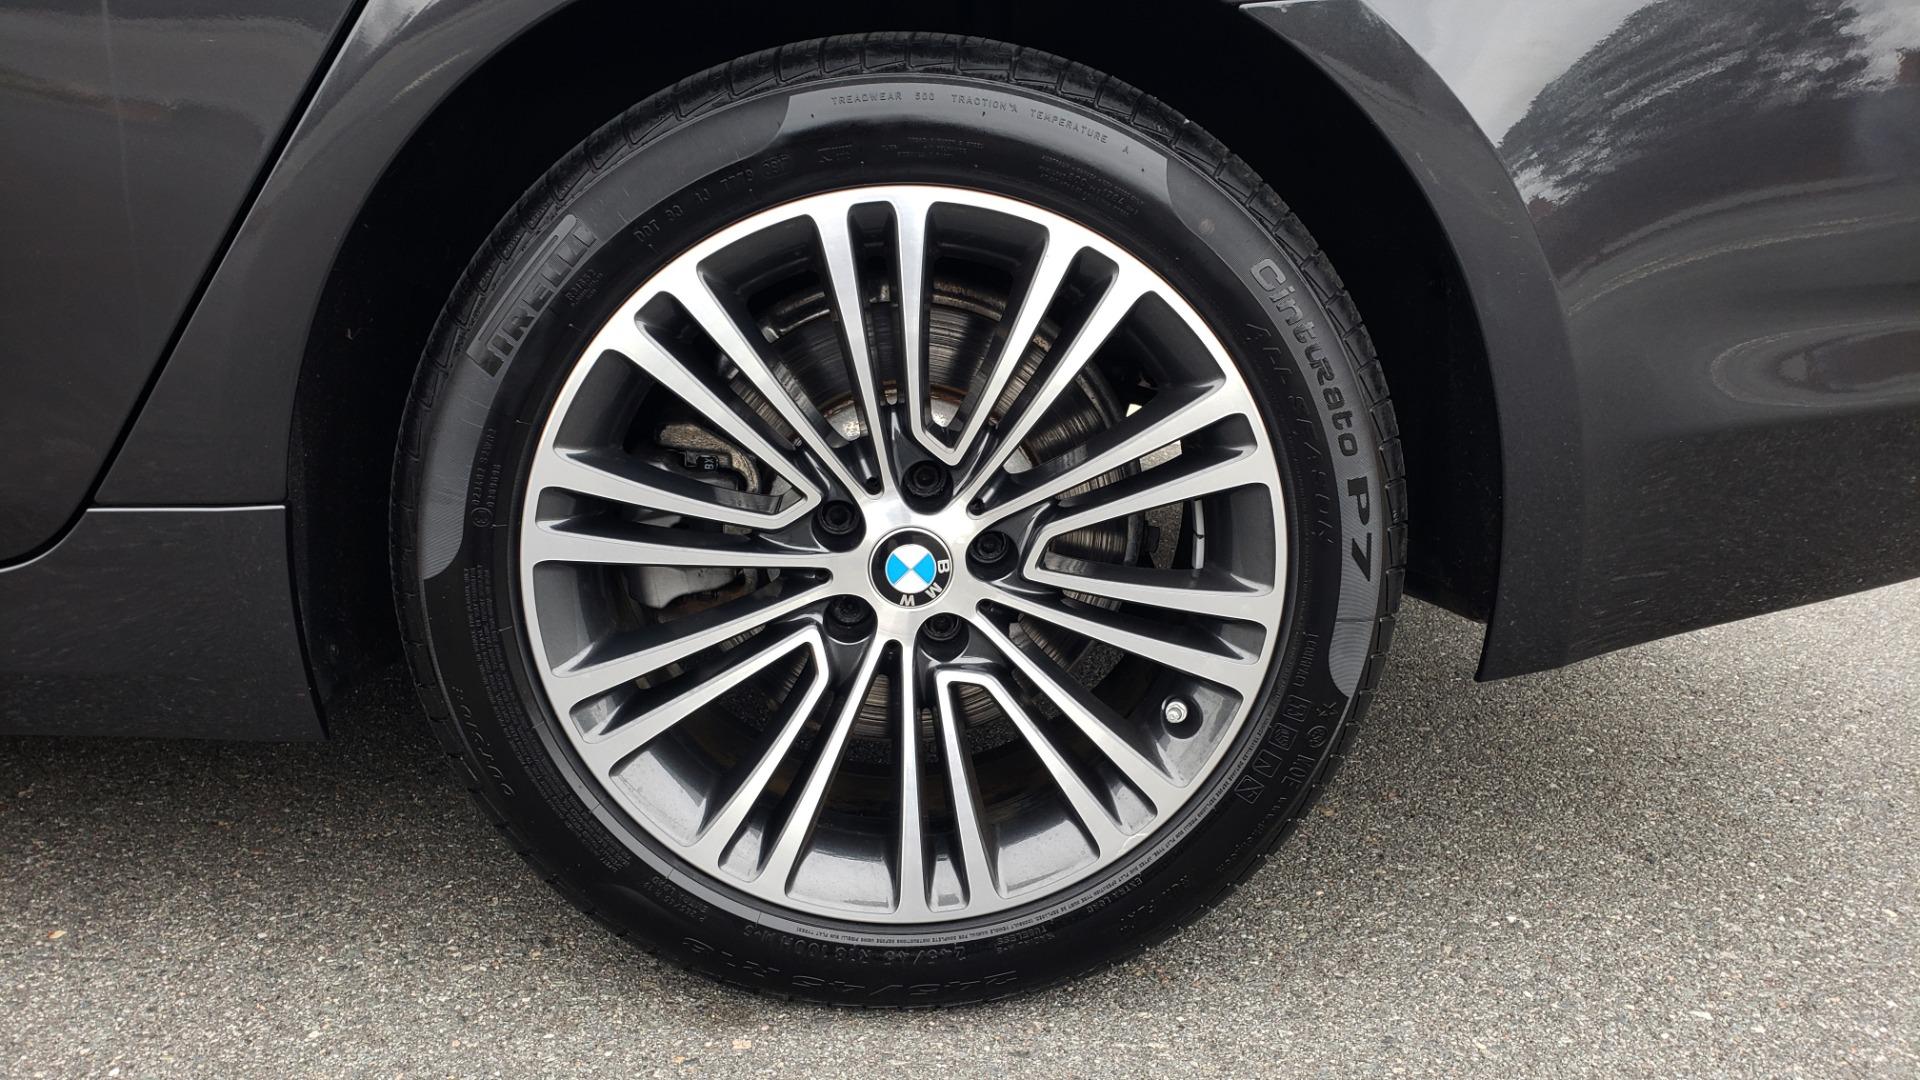 Used 2017 BMW 5 SERIES 530IXDRIVE / PREM PKG / DRVR ASST PLUS / CLD WTHR / APPLE CARPLAY for sale Sold at Formula Imports in Charlotte NC 28227 80